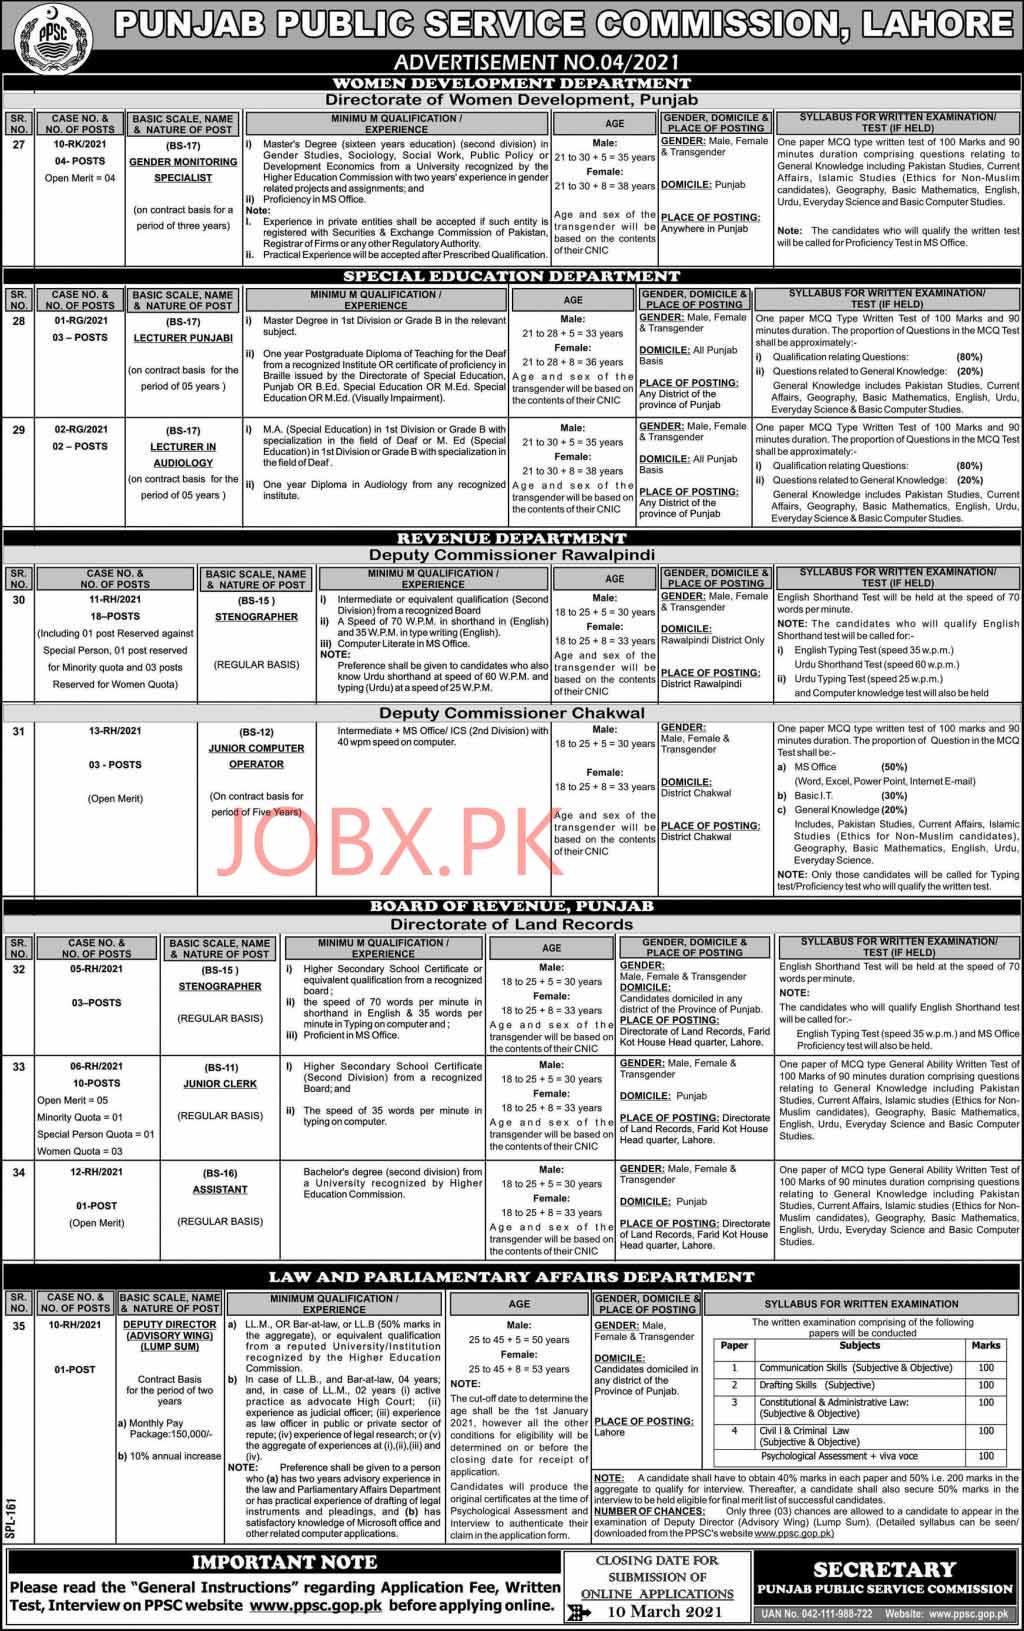 PPSC Feb 2021 Jobs Advertisment No.4